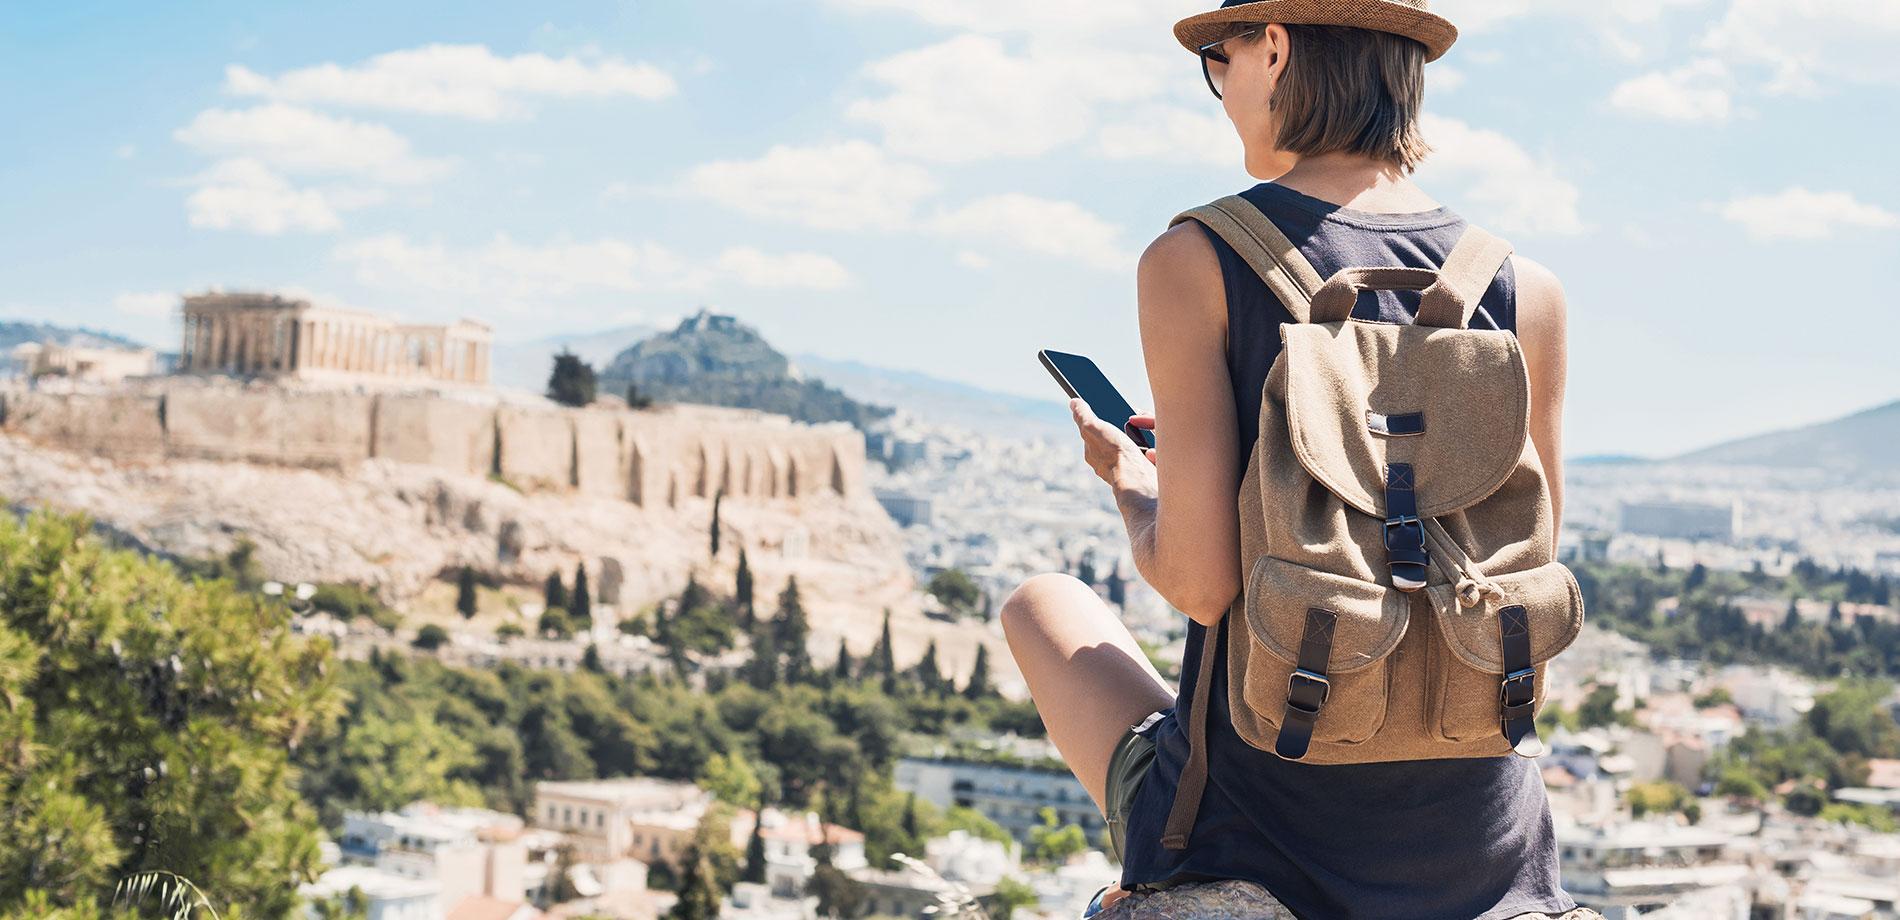 google travel, google viajes, viajes google, plataforma anuncios hoteles google, google para anunciantes de hoteles y agencias de viajes, como me anuncio en google si soy agencia de viajes, viajes avión google, como funciona google travel